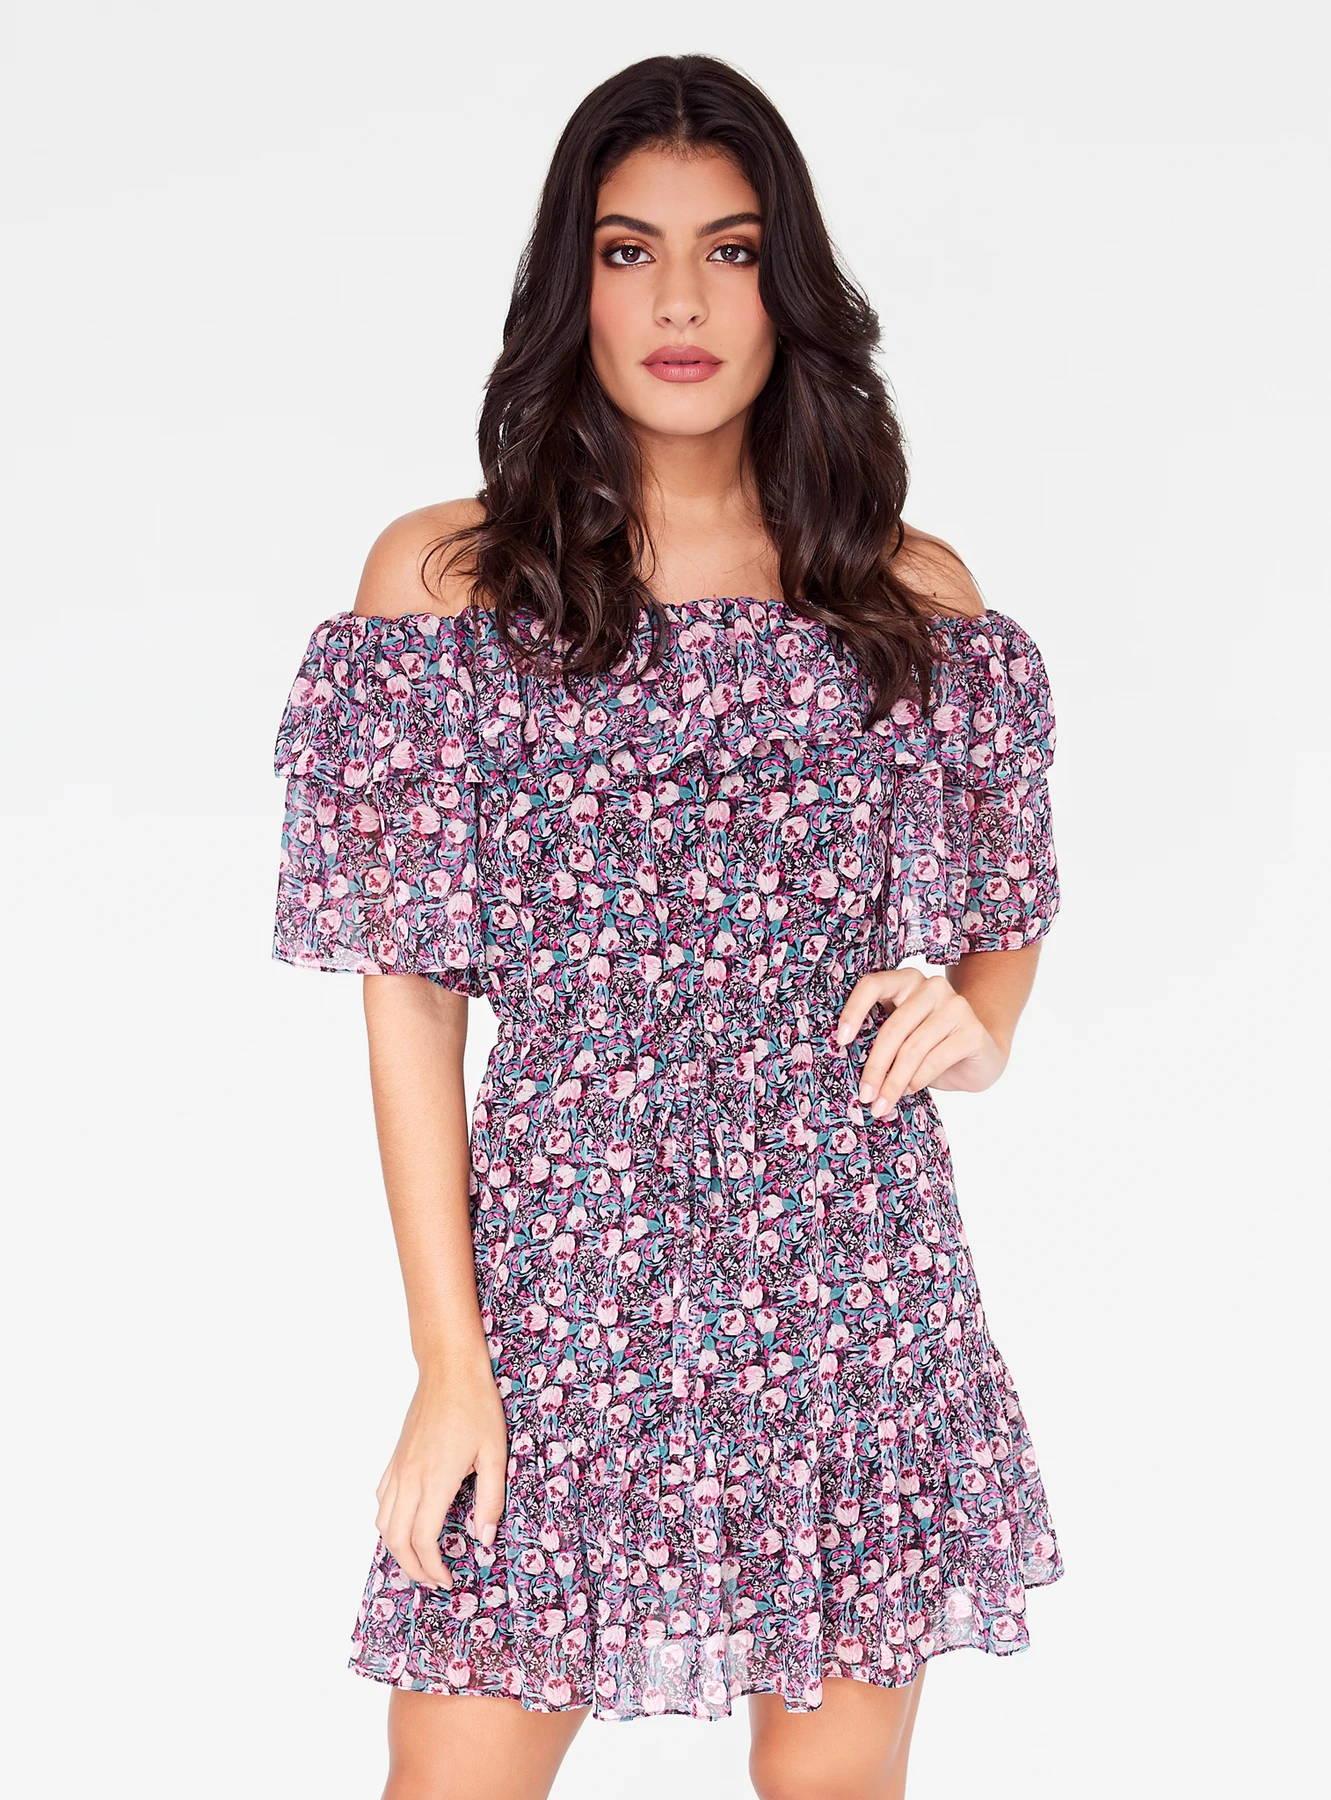 Pink Floral Off-the-Shoulder Ruffle Dress